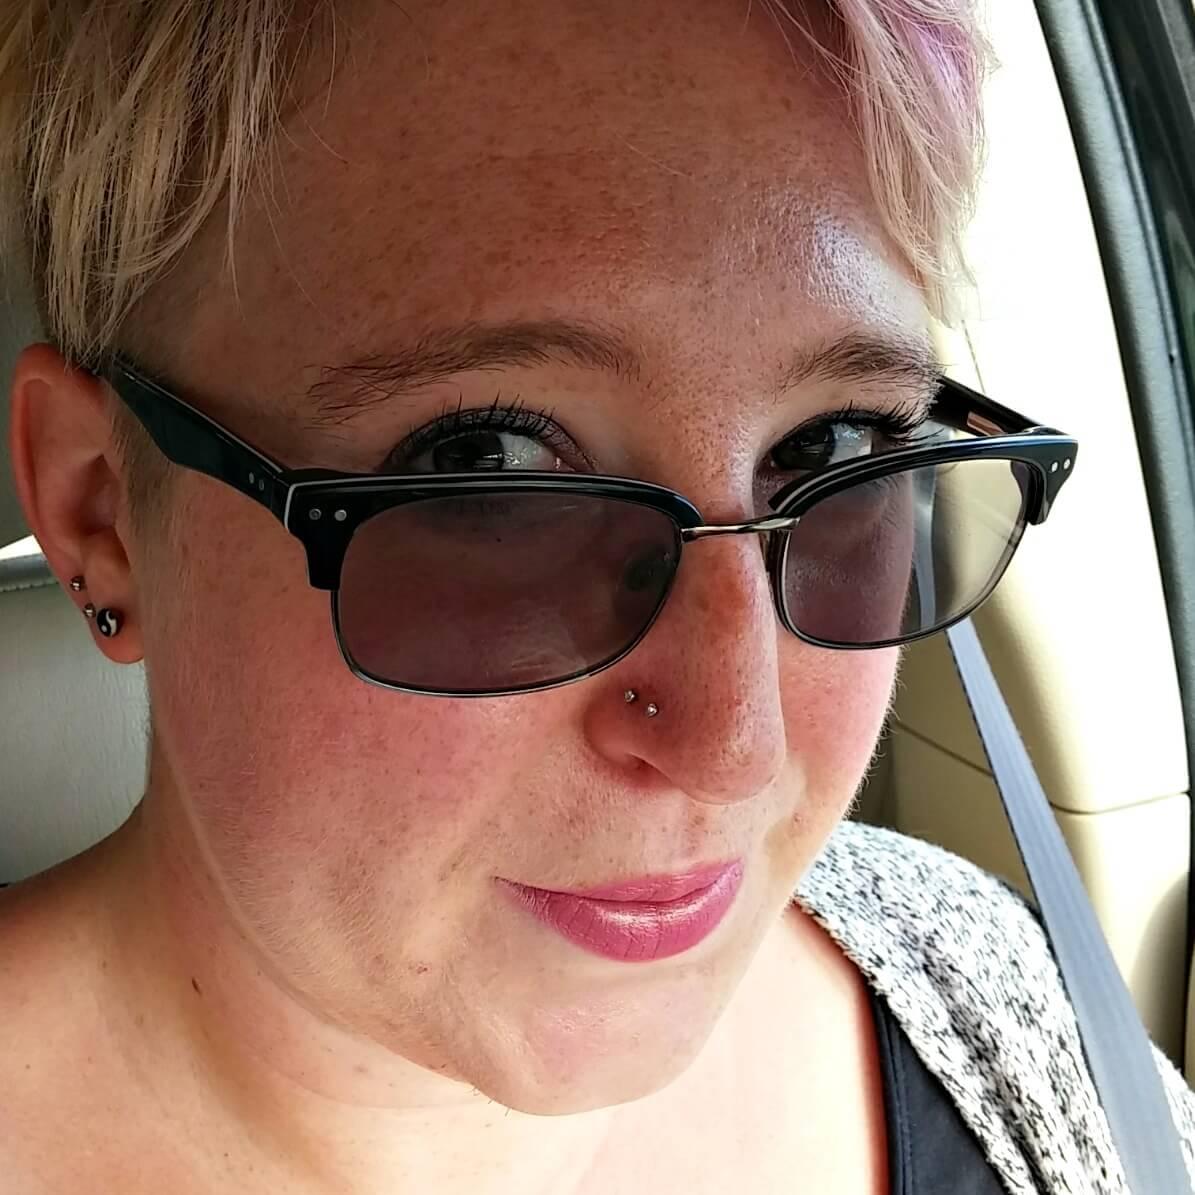 Selfie nose studs